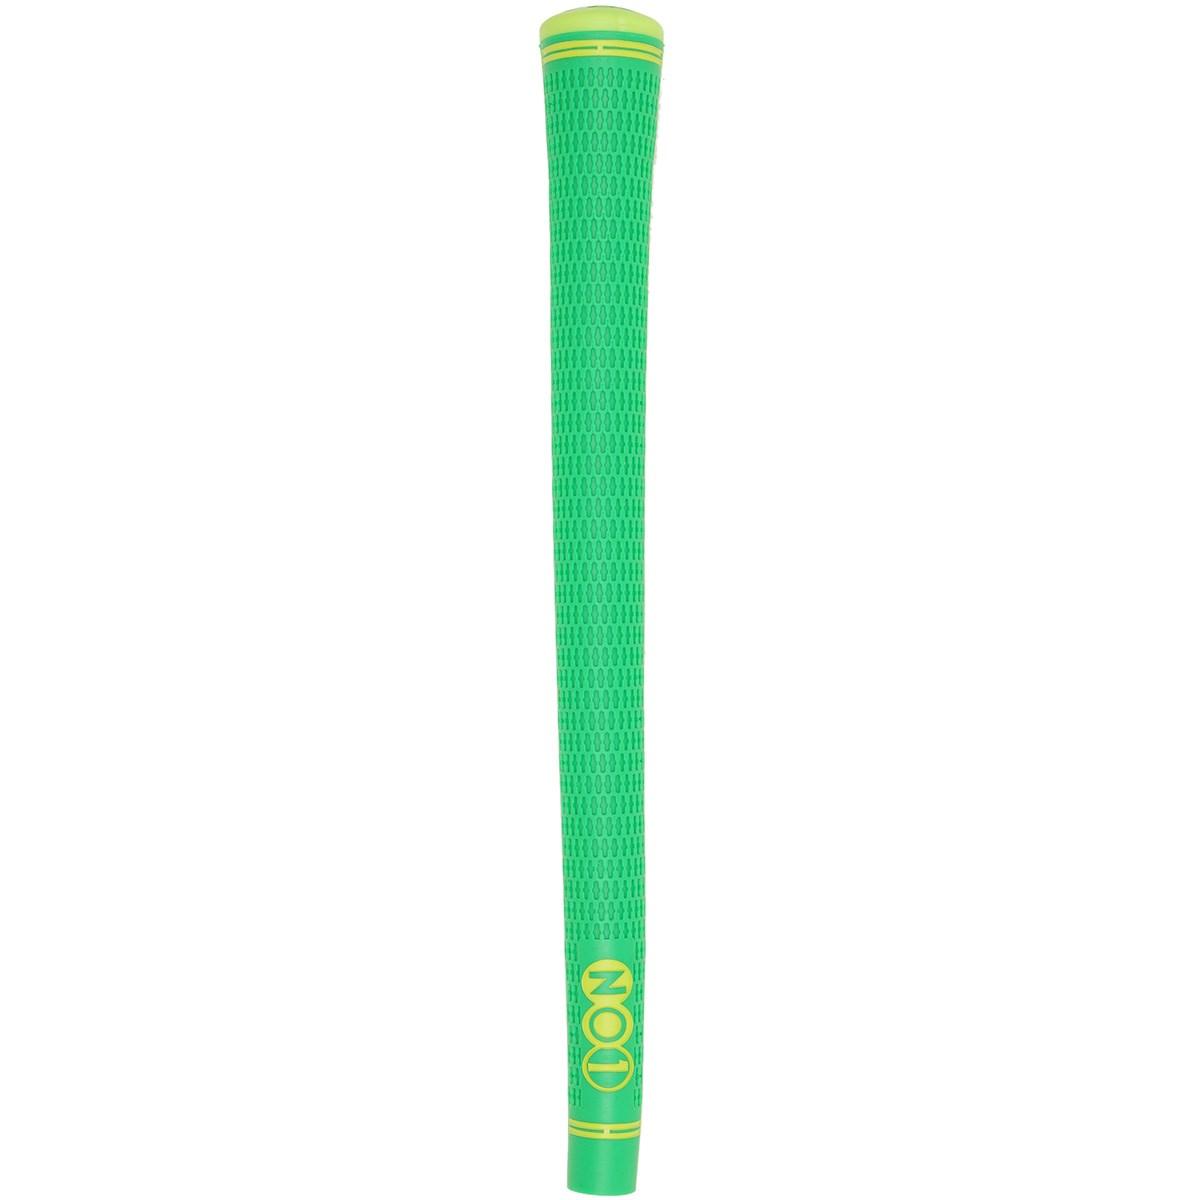 NO1グリップ NO1Grip 50シリーズ グリップ 有り 内径:14mm グリーン